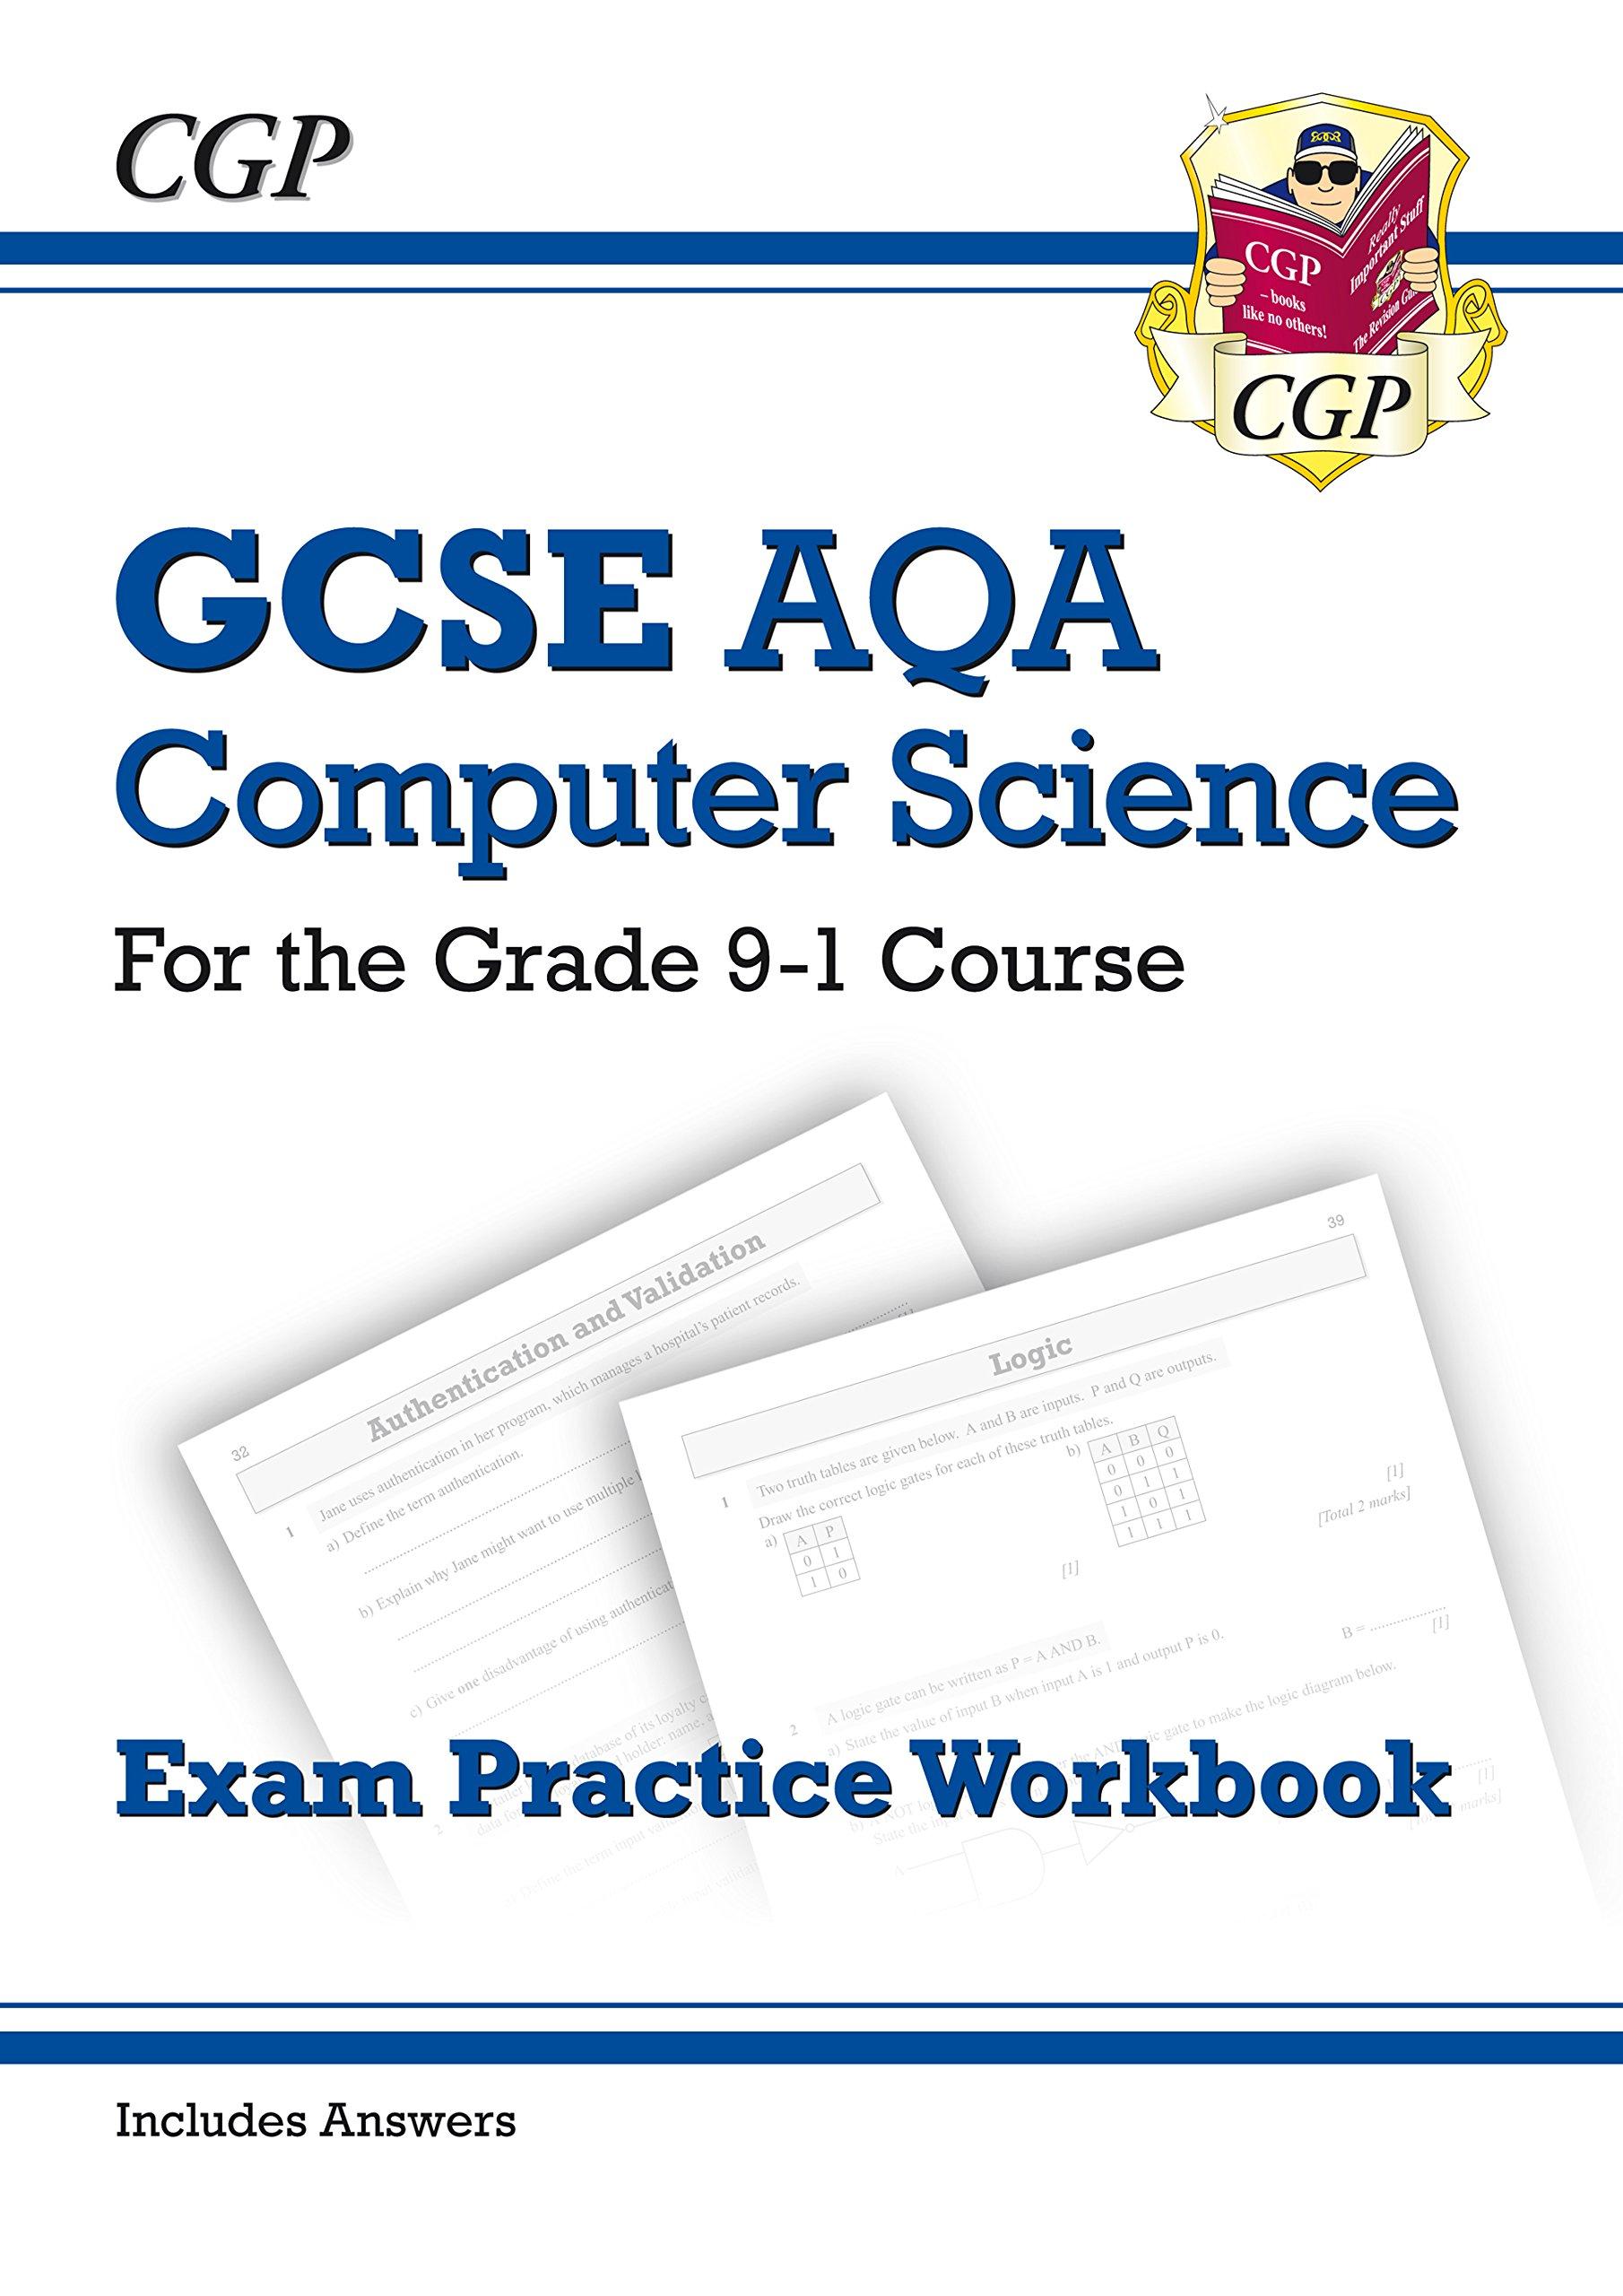 New GCSE Computer Science AQA Exam Practice Workbook - for the Grade